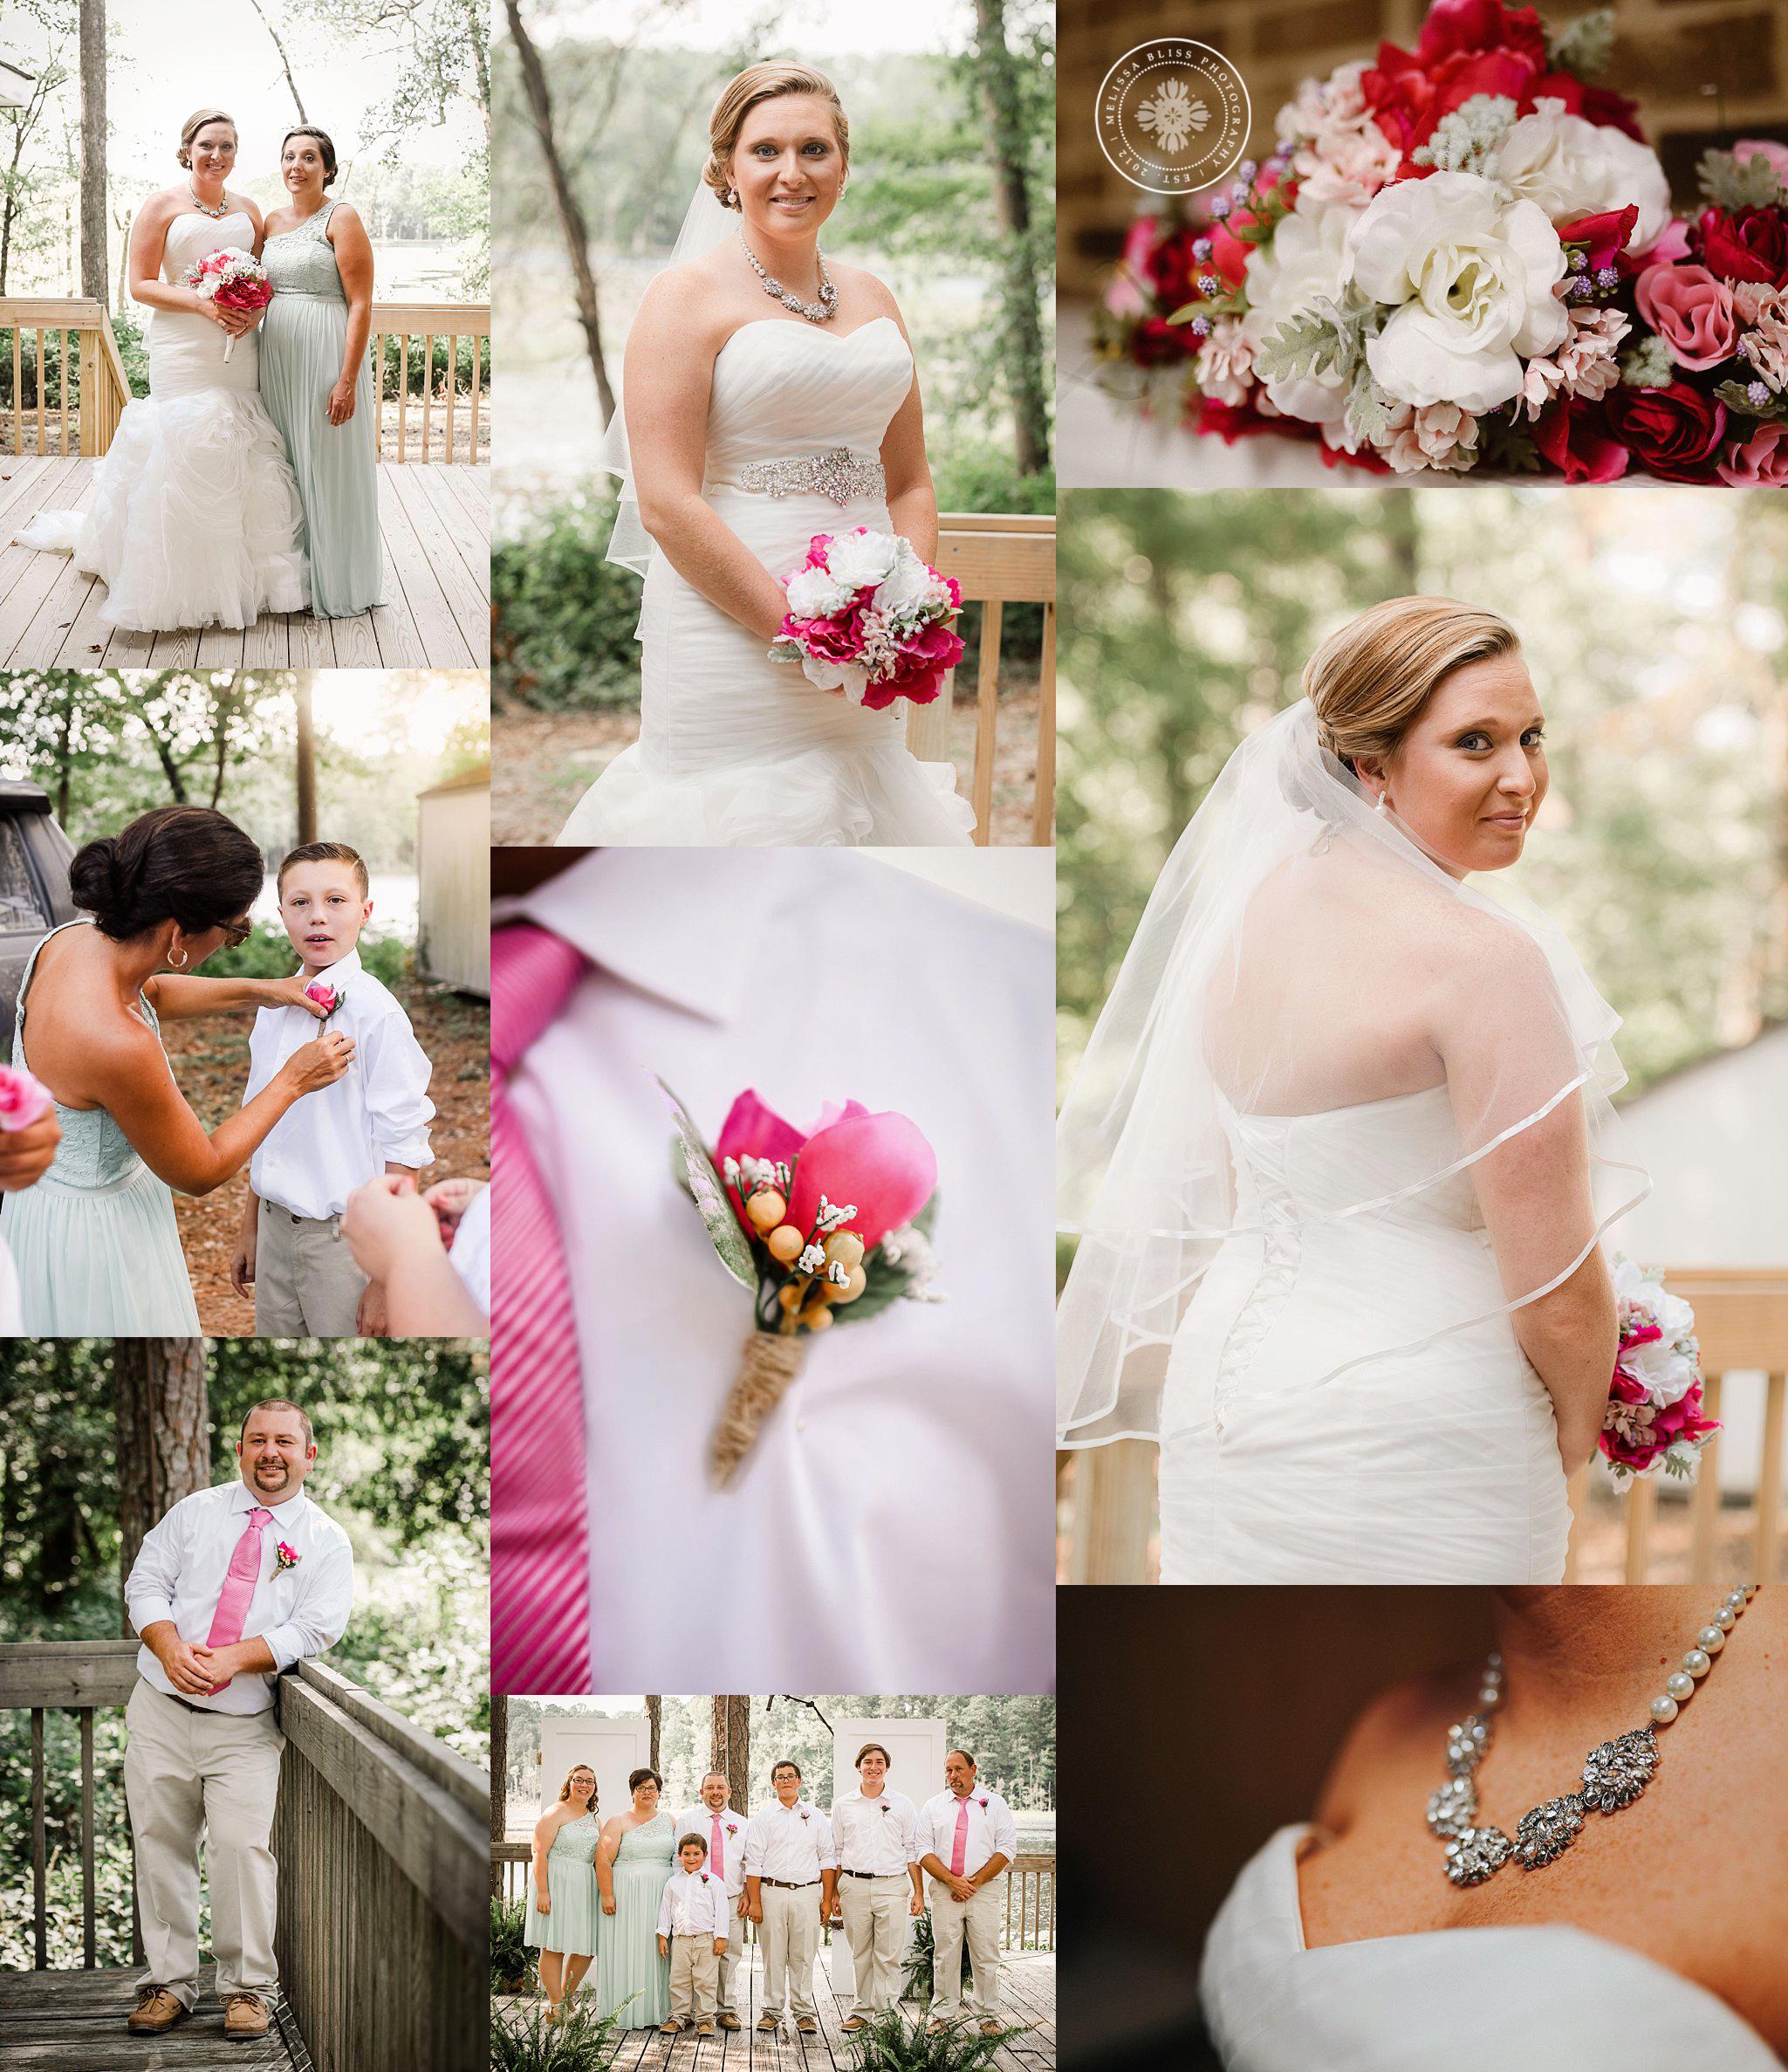 norfolk-wedding-photographers-virginia-beach-wedding-photographers-portsmouth-wedding-photographers-williamsburg-wedding-photographers-new-kent-richmond-wedding-photographer-melissa-bliss-photography-summer-wedding.jpg